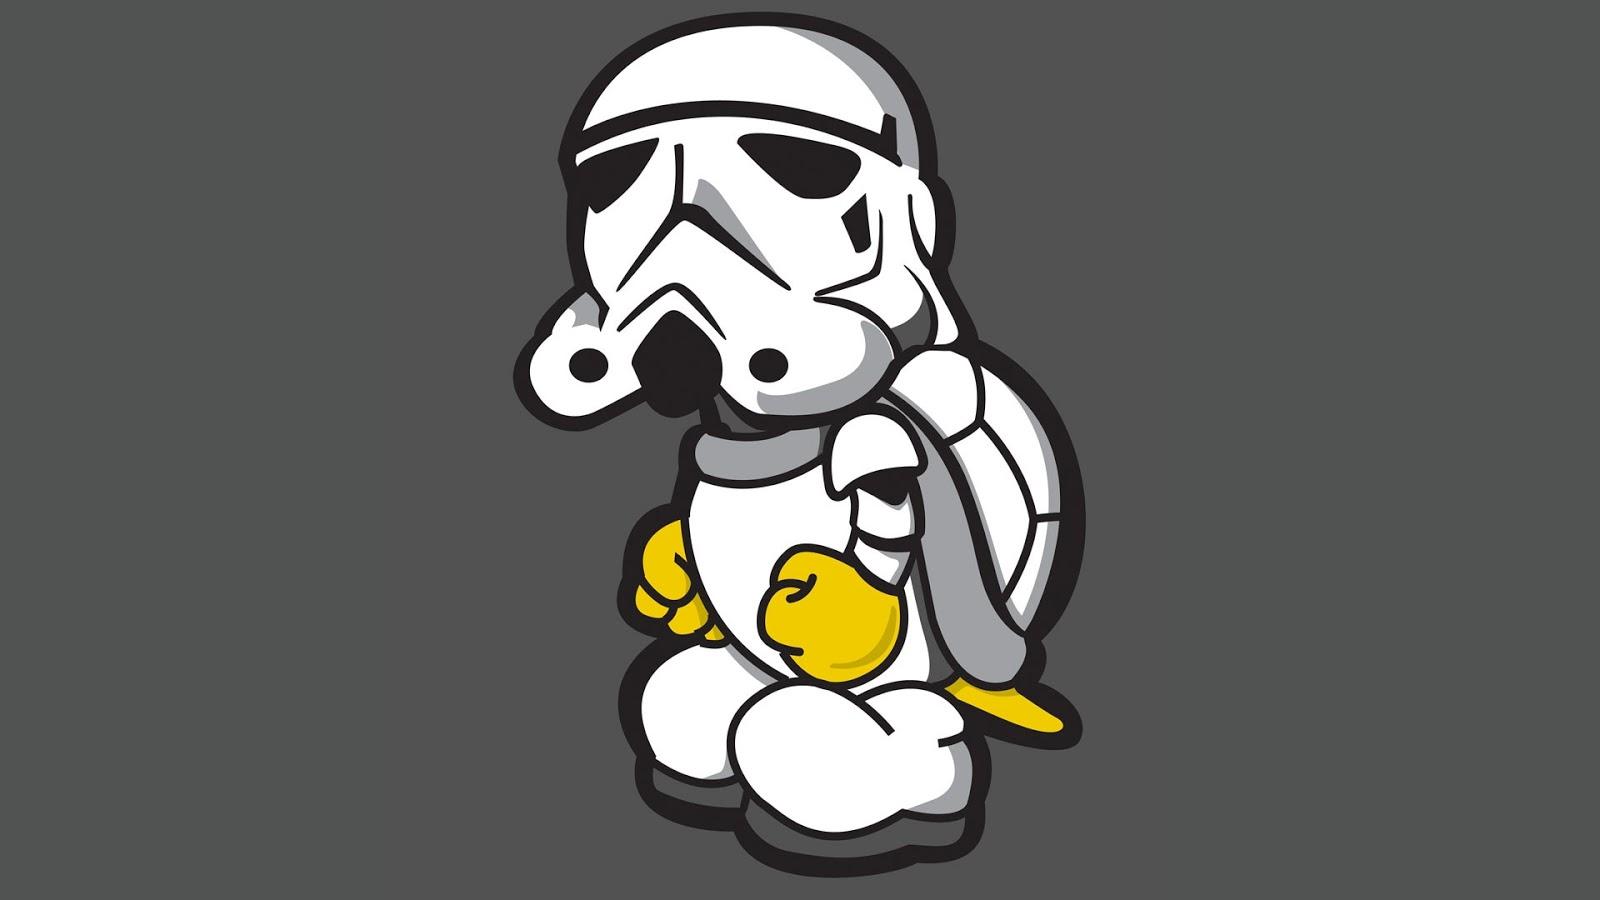 50 Star Wars Wallpapers Hd 4k 2020 We 7